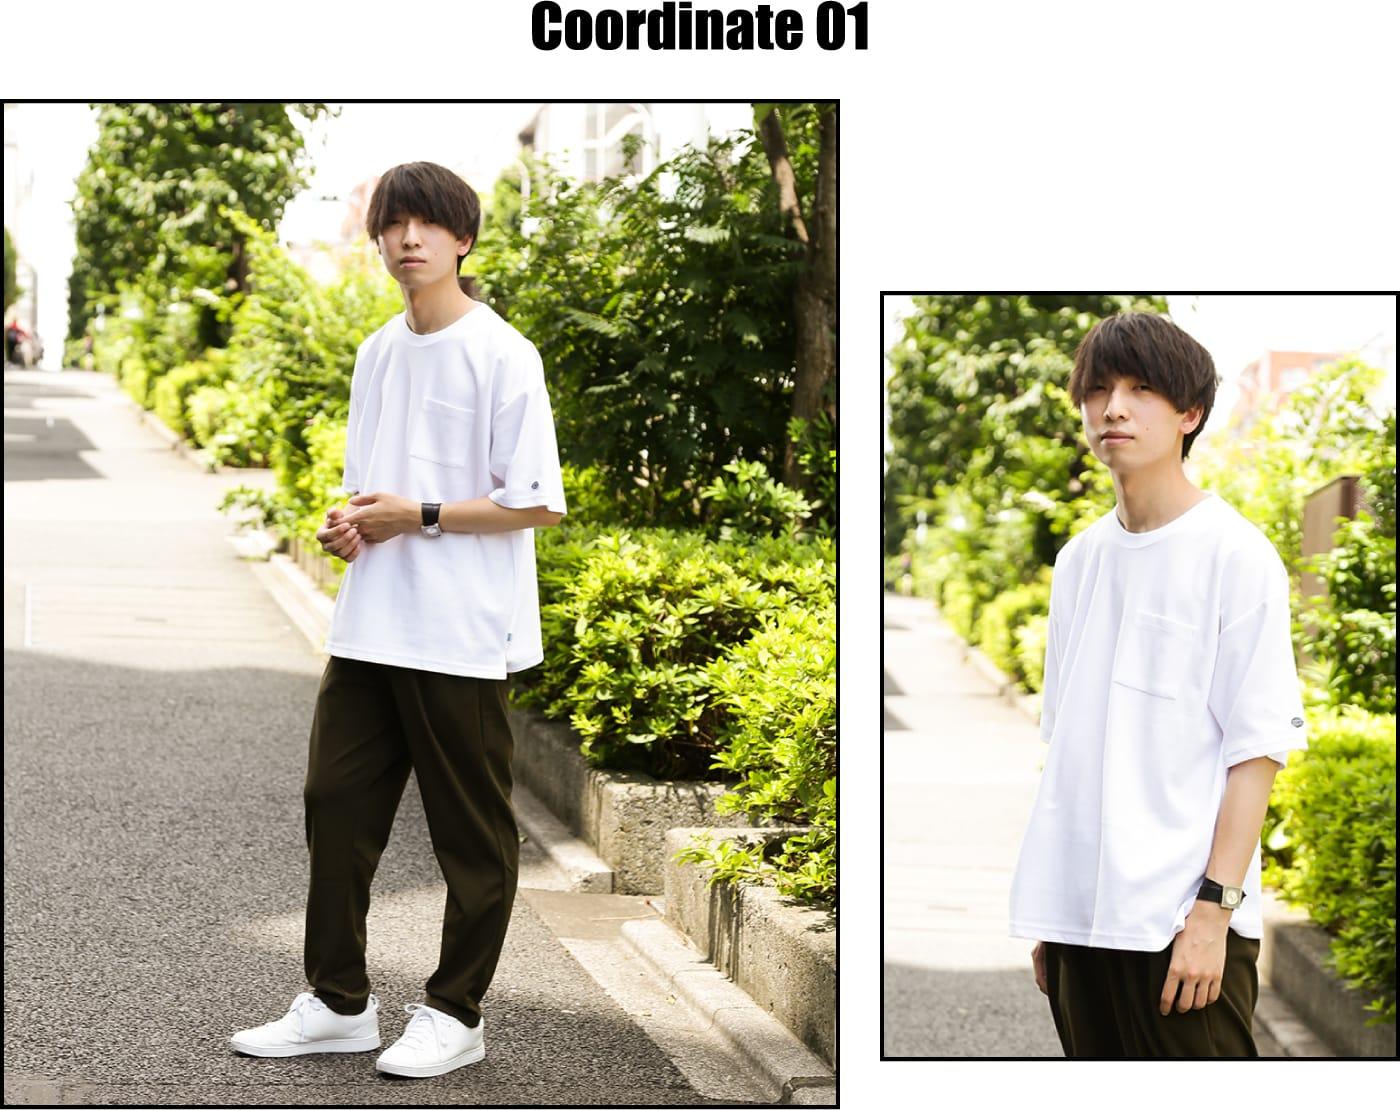 Coordinate 01